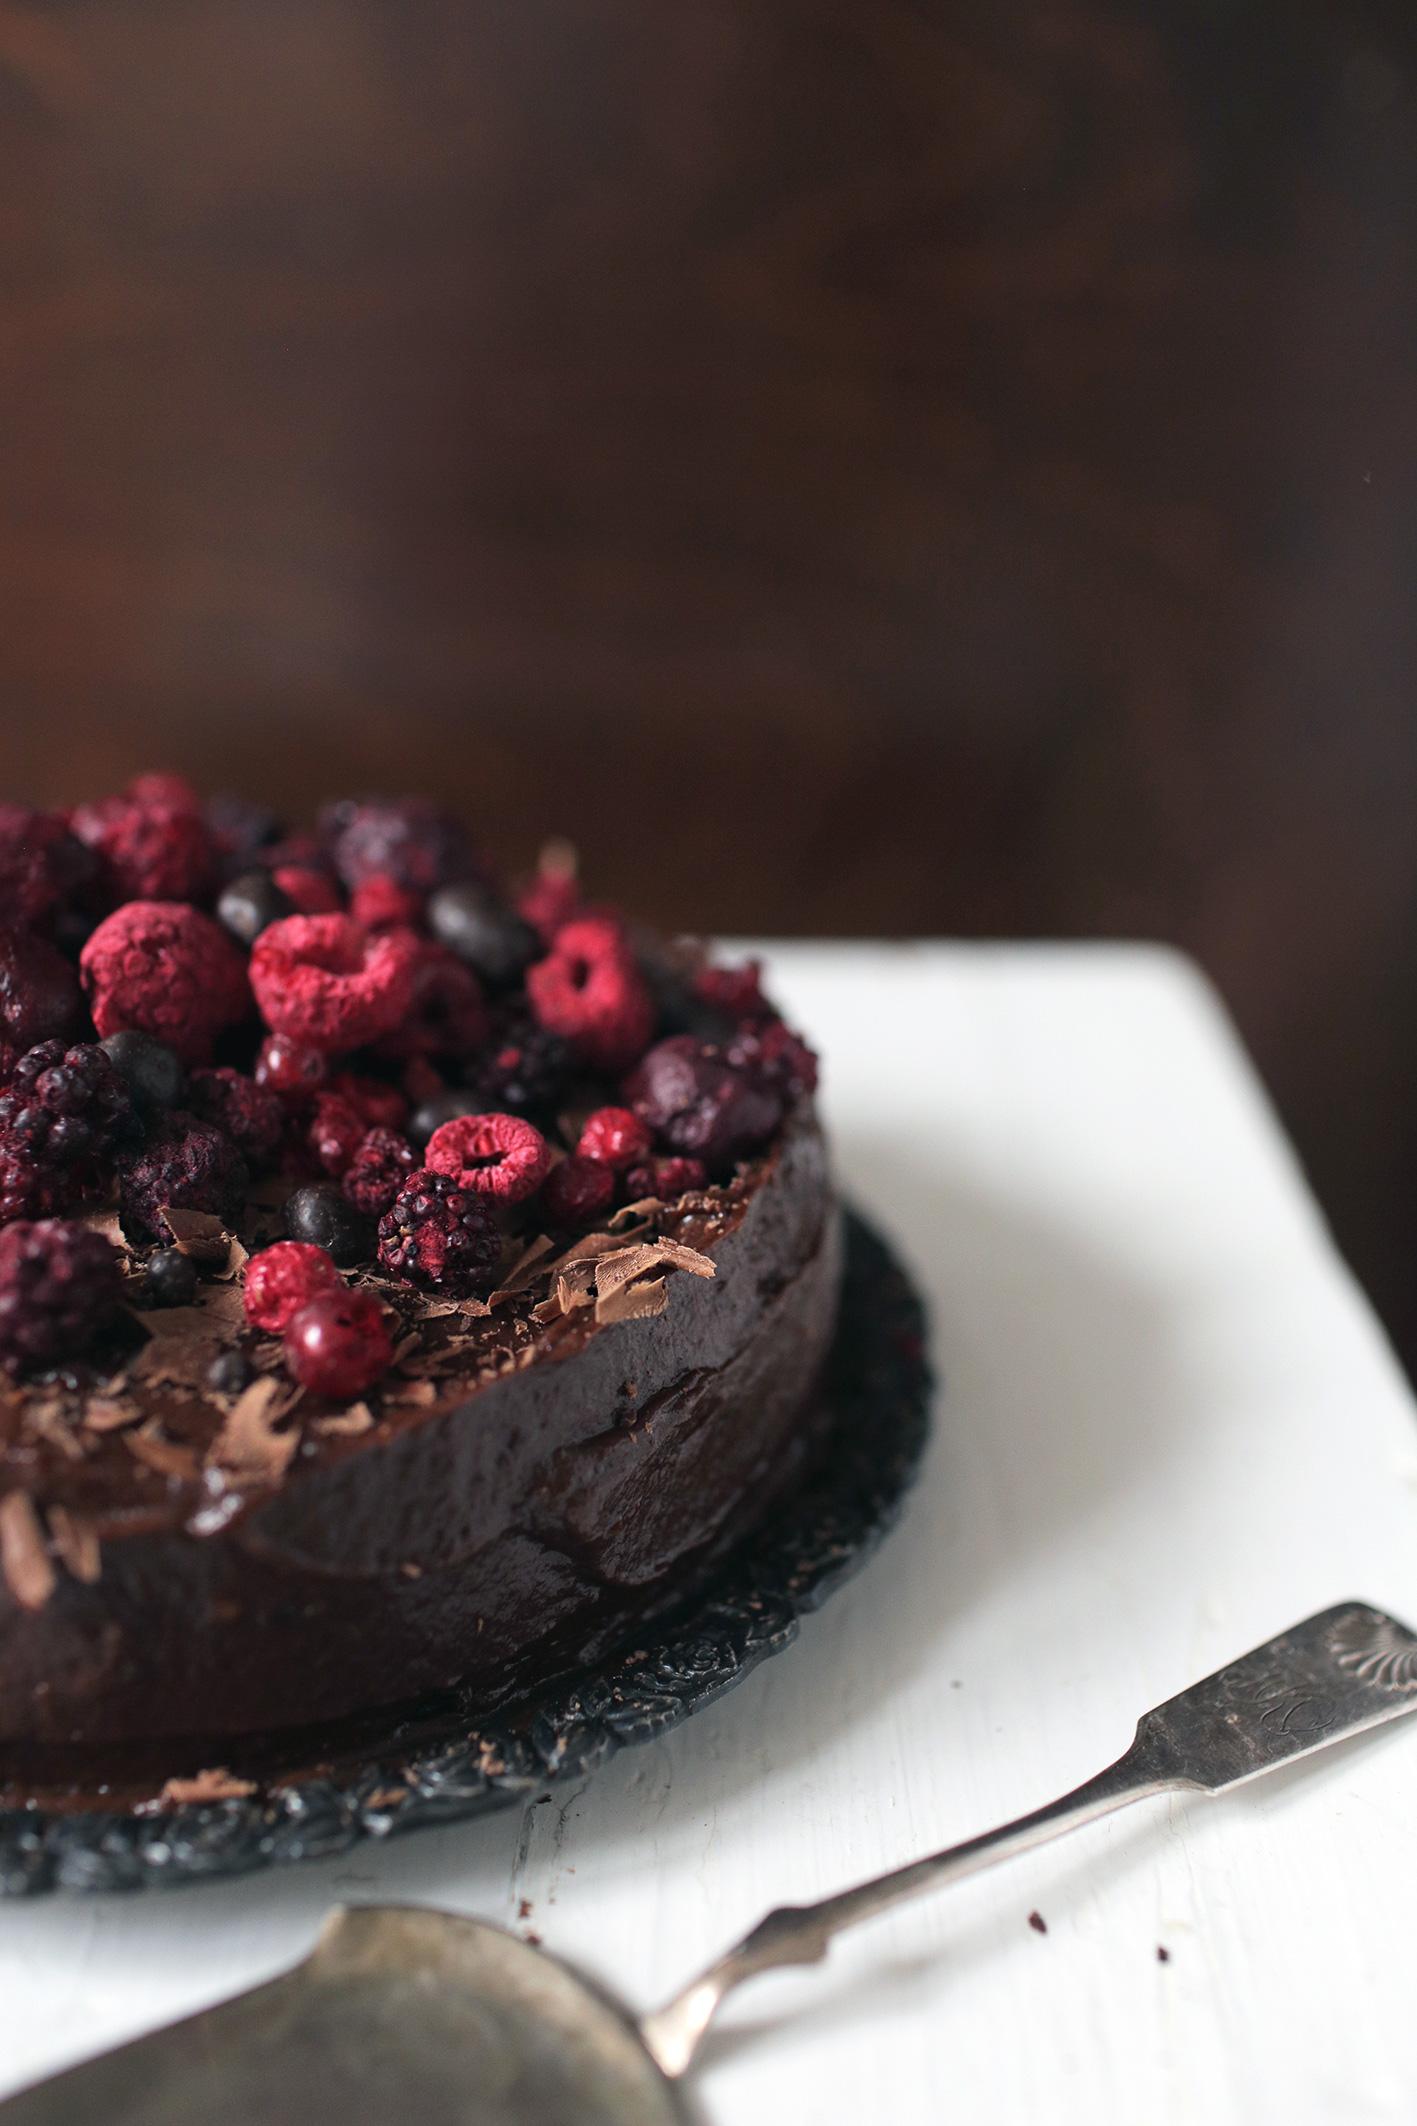 beet-root-chocolate-cake-no-gluten-no-sugar-3.jpg